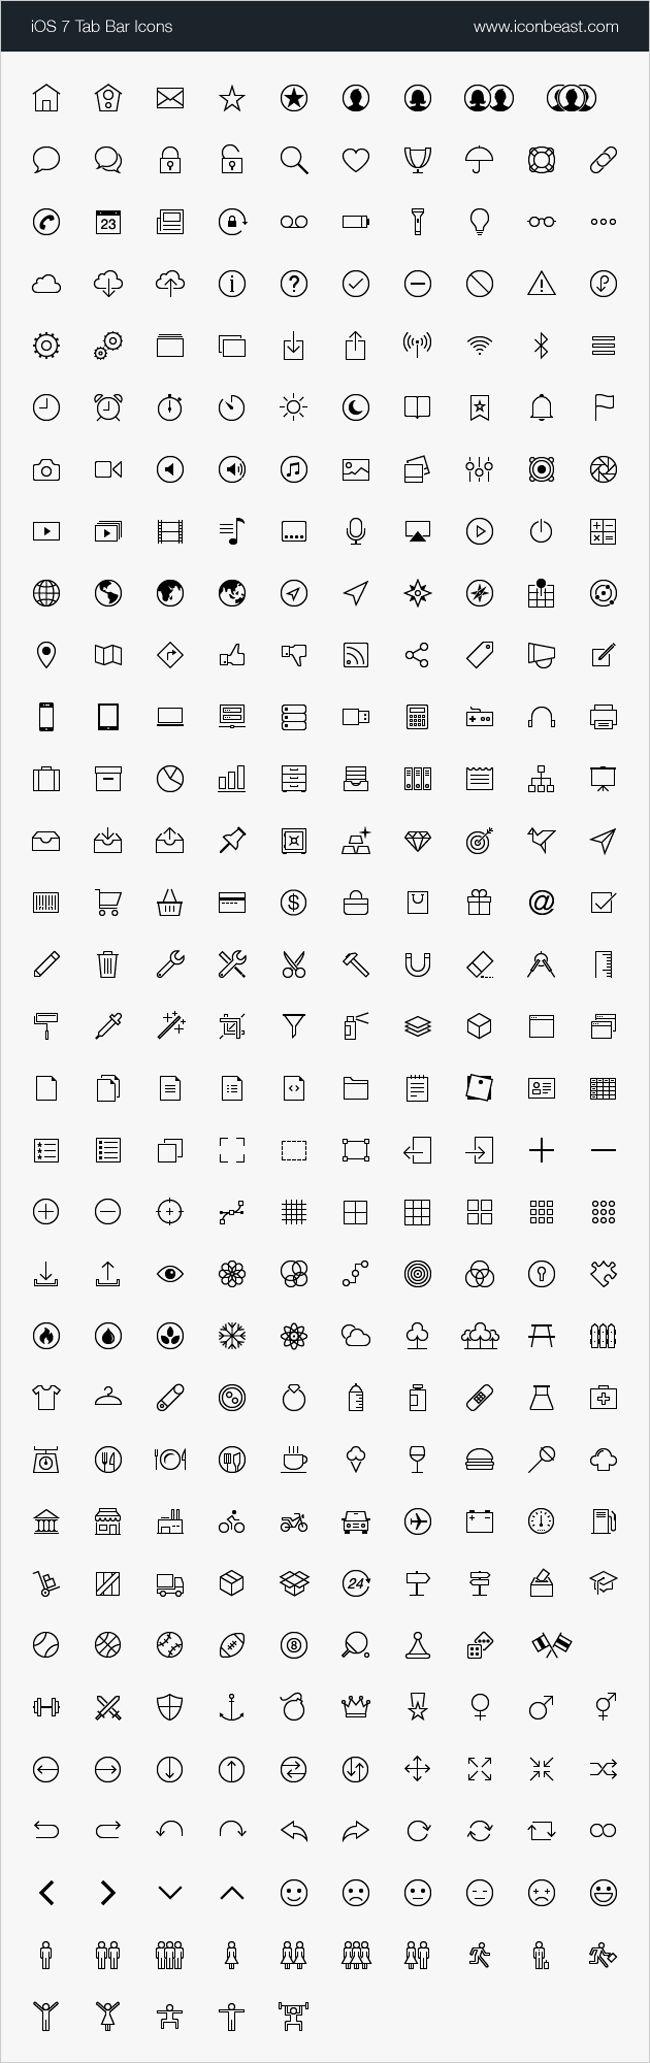 2,000  High-Quality, iOS Tab Bar and Toolbar Icons